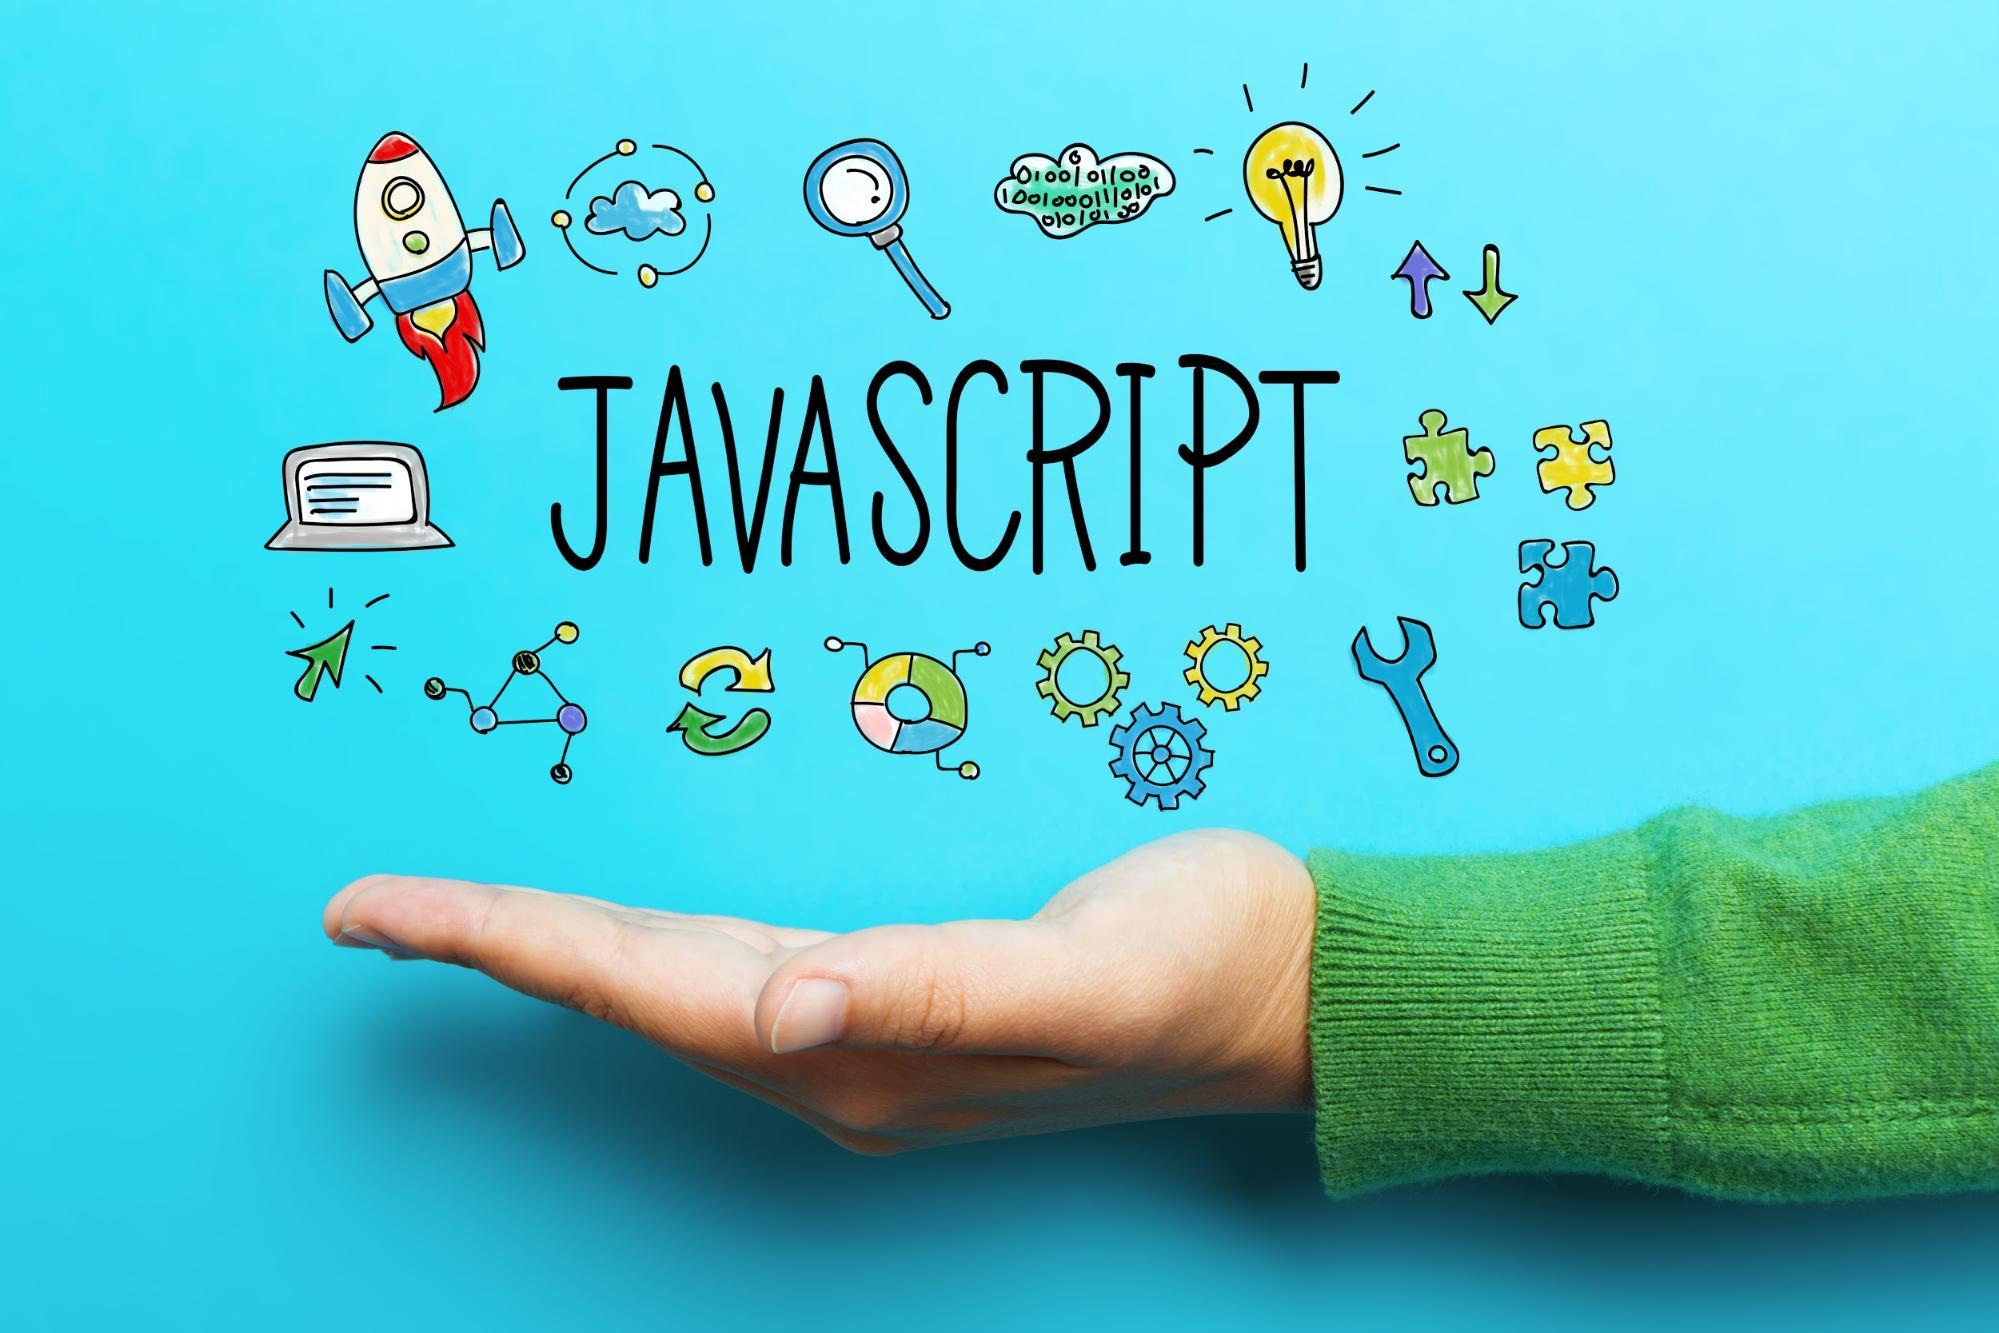 5 Best JavaScript Libraries for Web Development